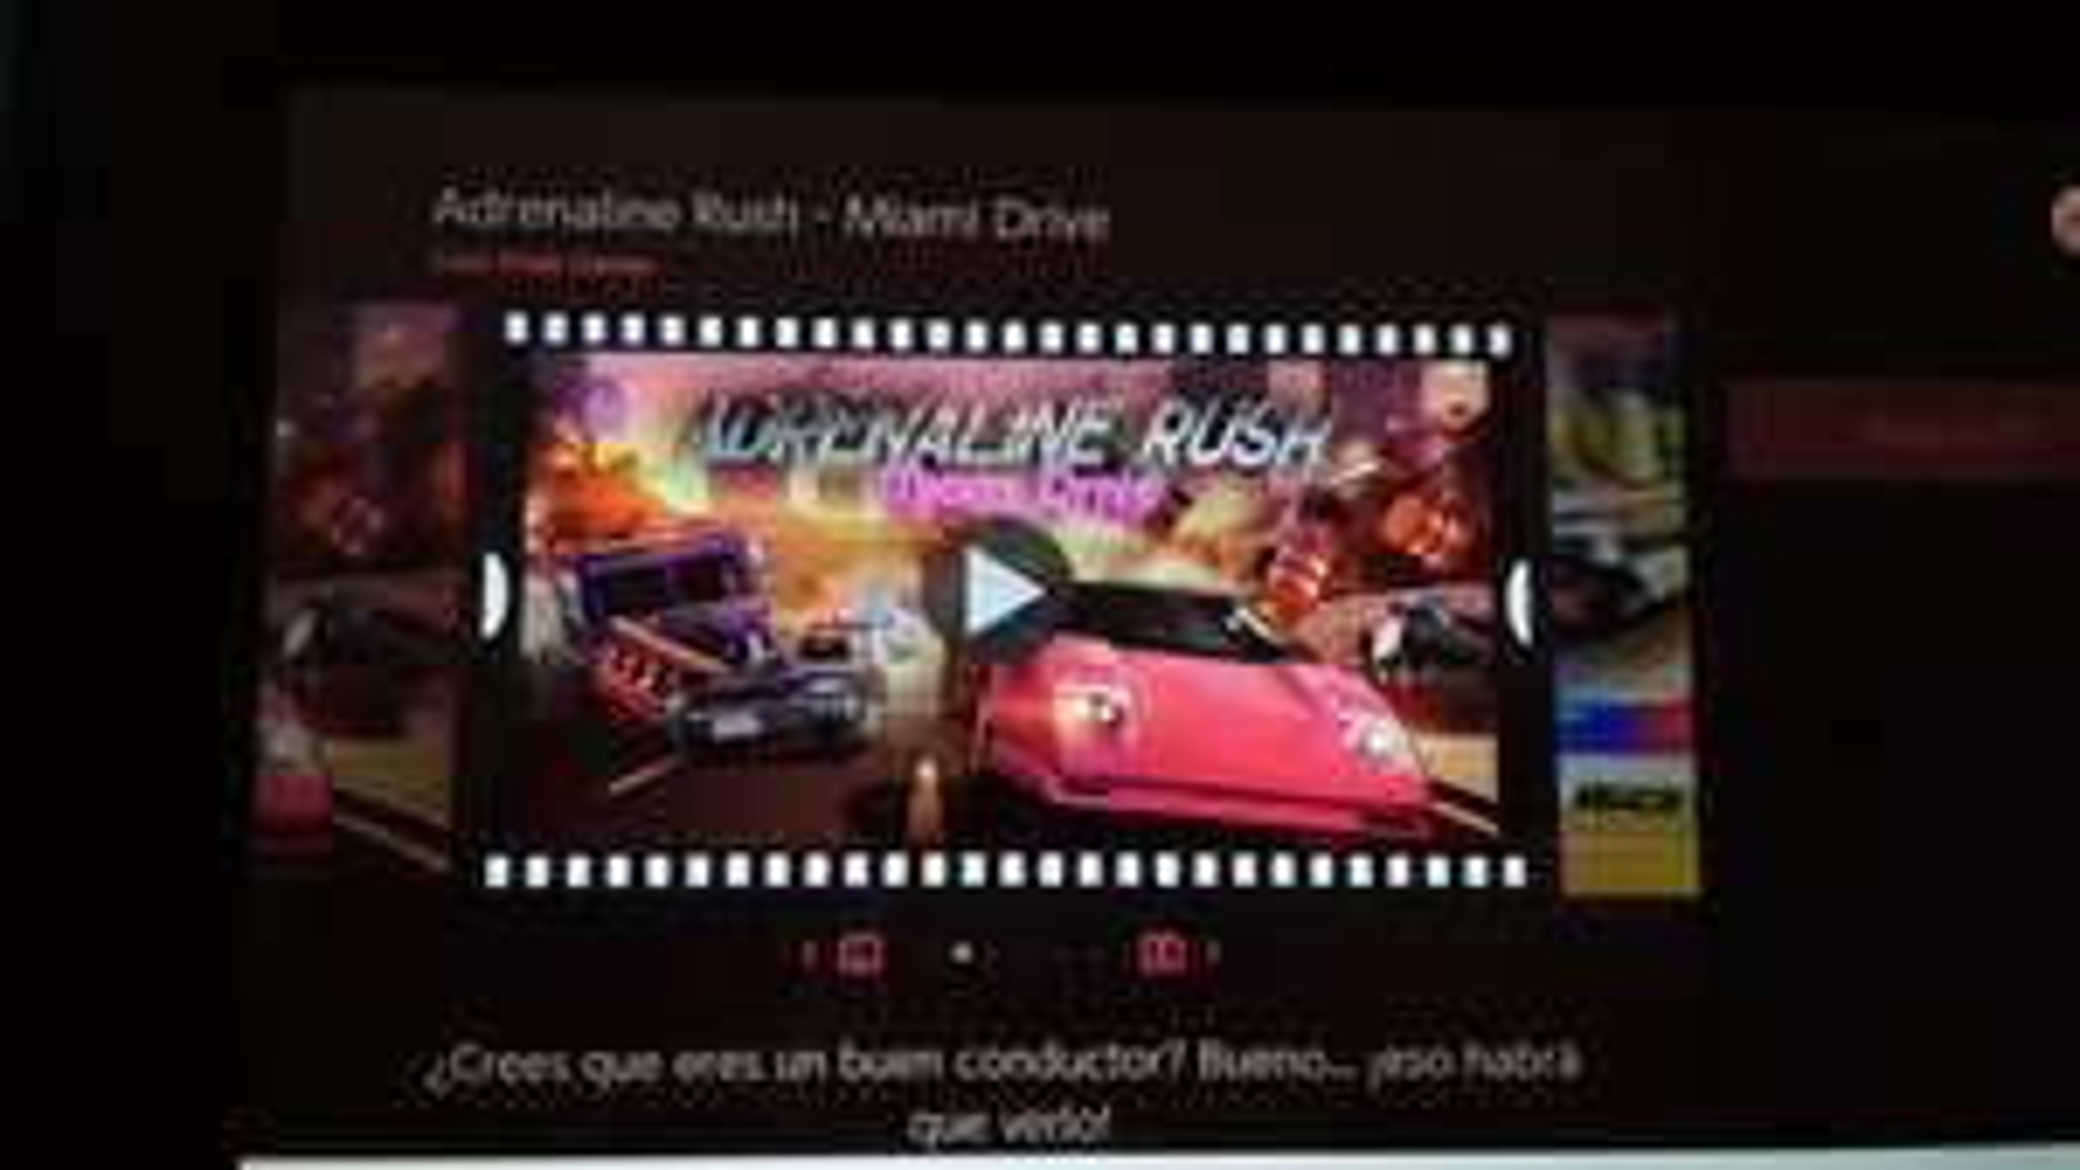 Nintendo eShop: Adrenaline Rush - Miami Drive - Nintendo Switch ( Gratis - Condicional)